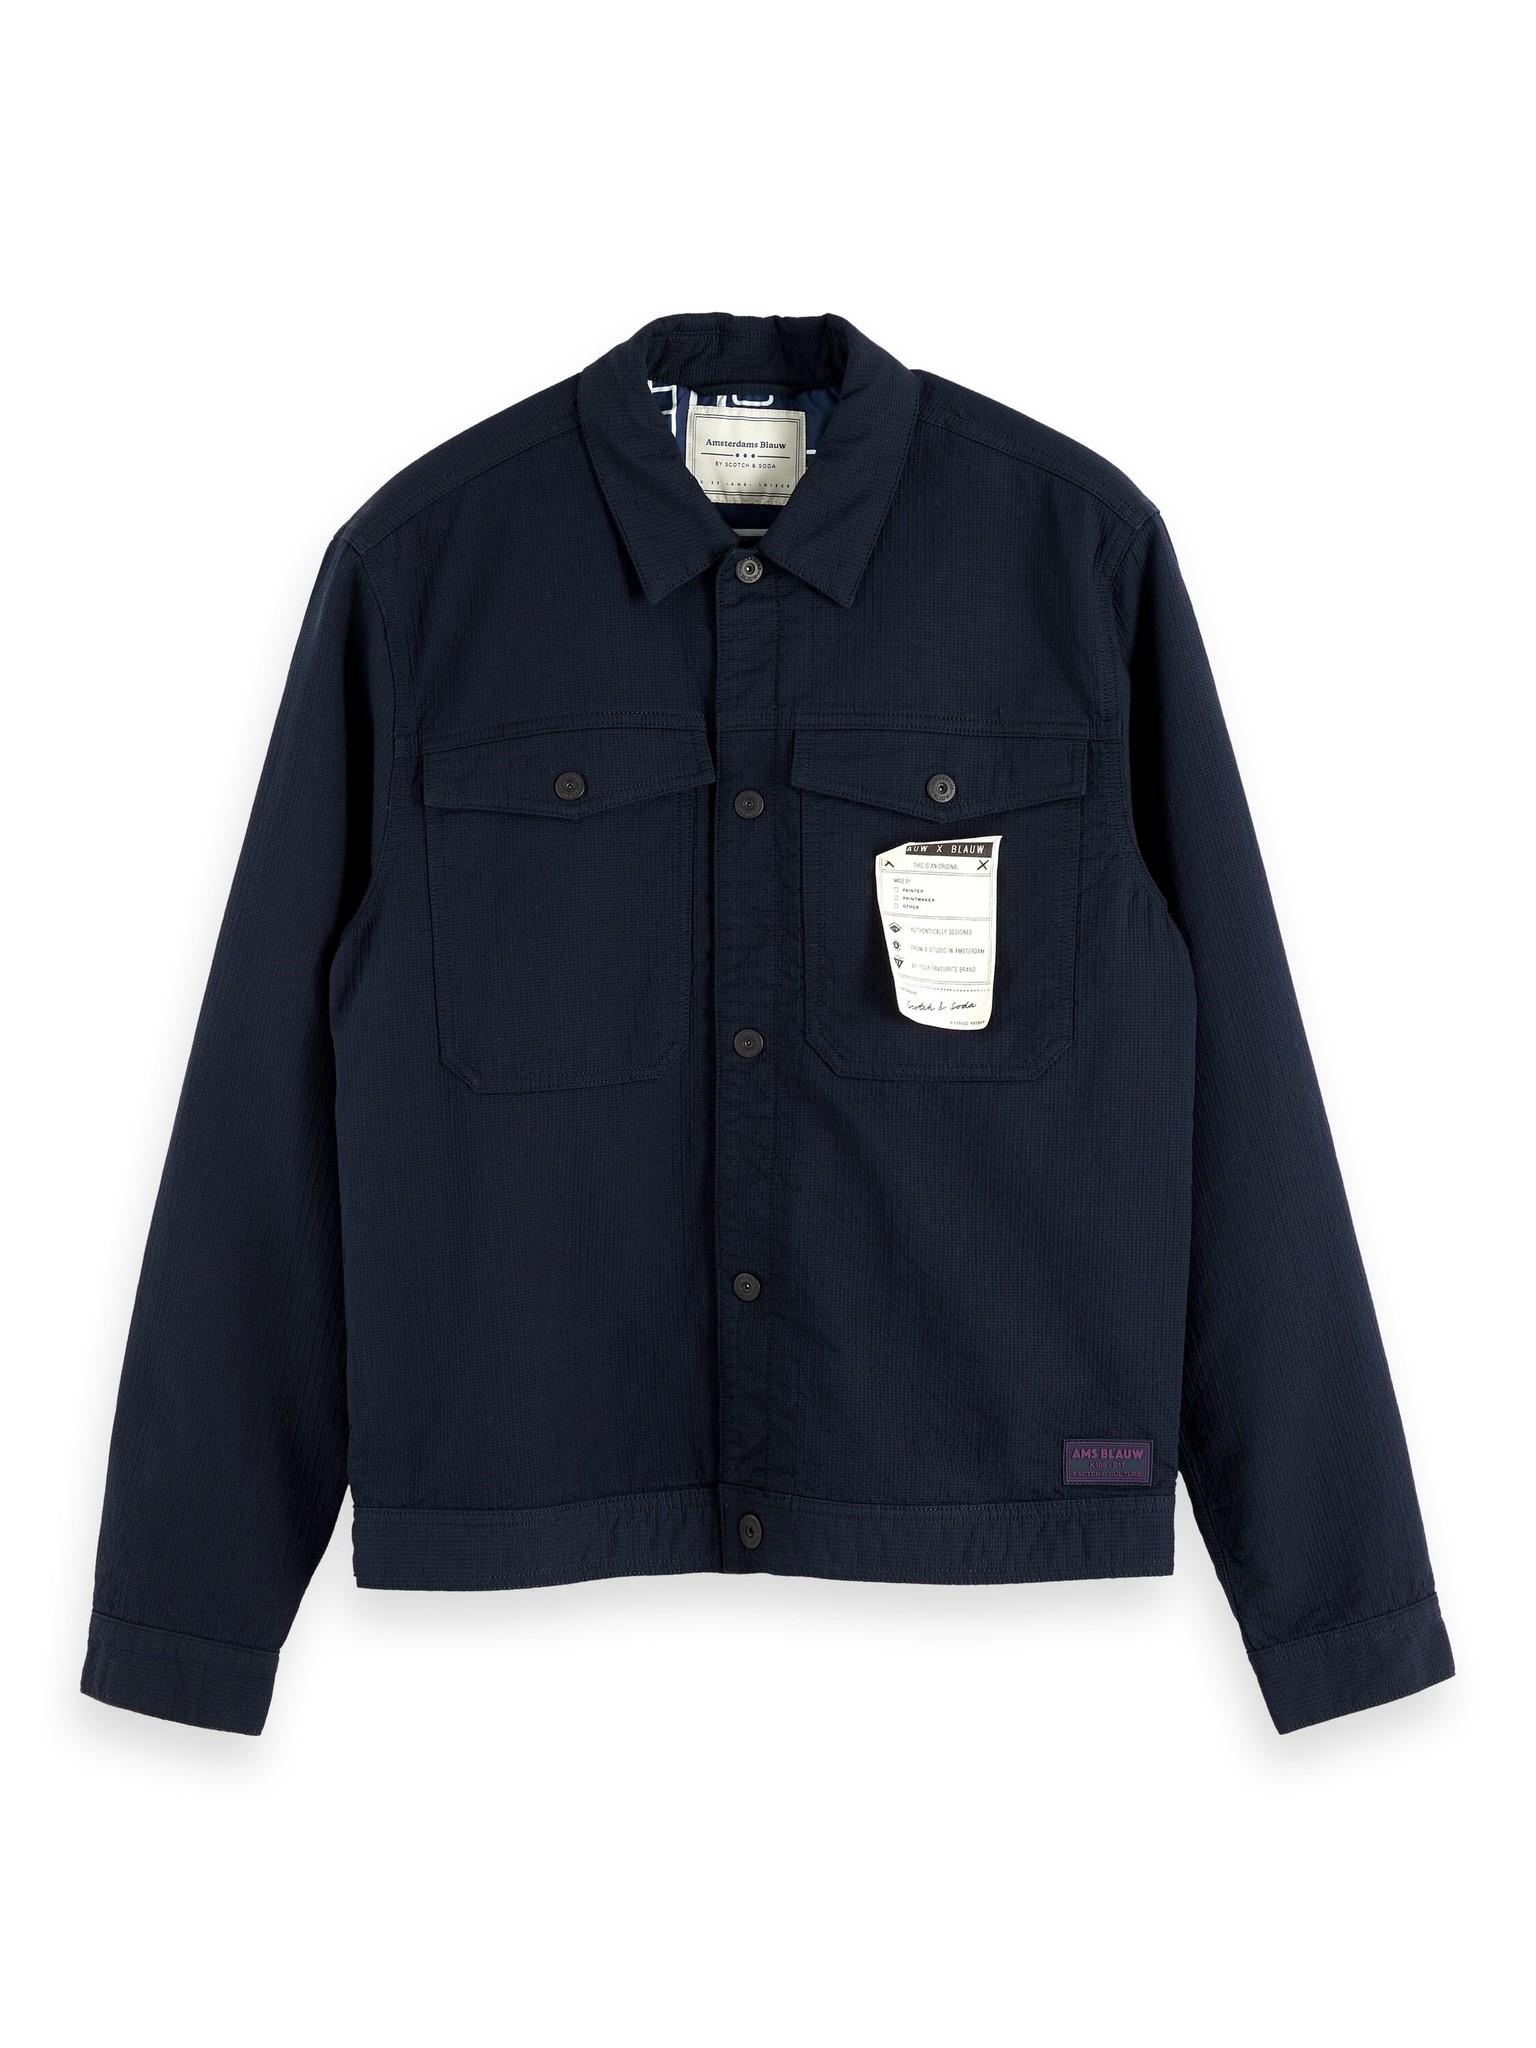 Scotch & Soda Lightweight Trucker Jacket